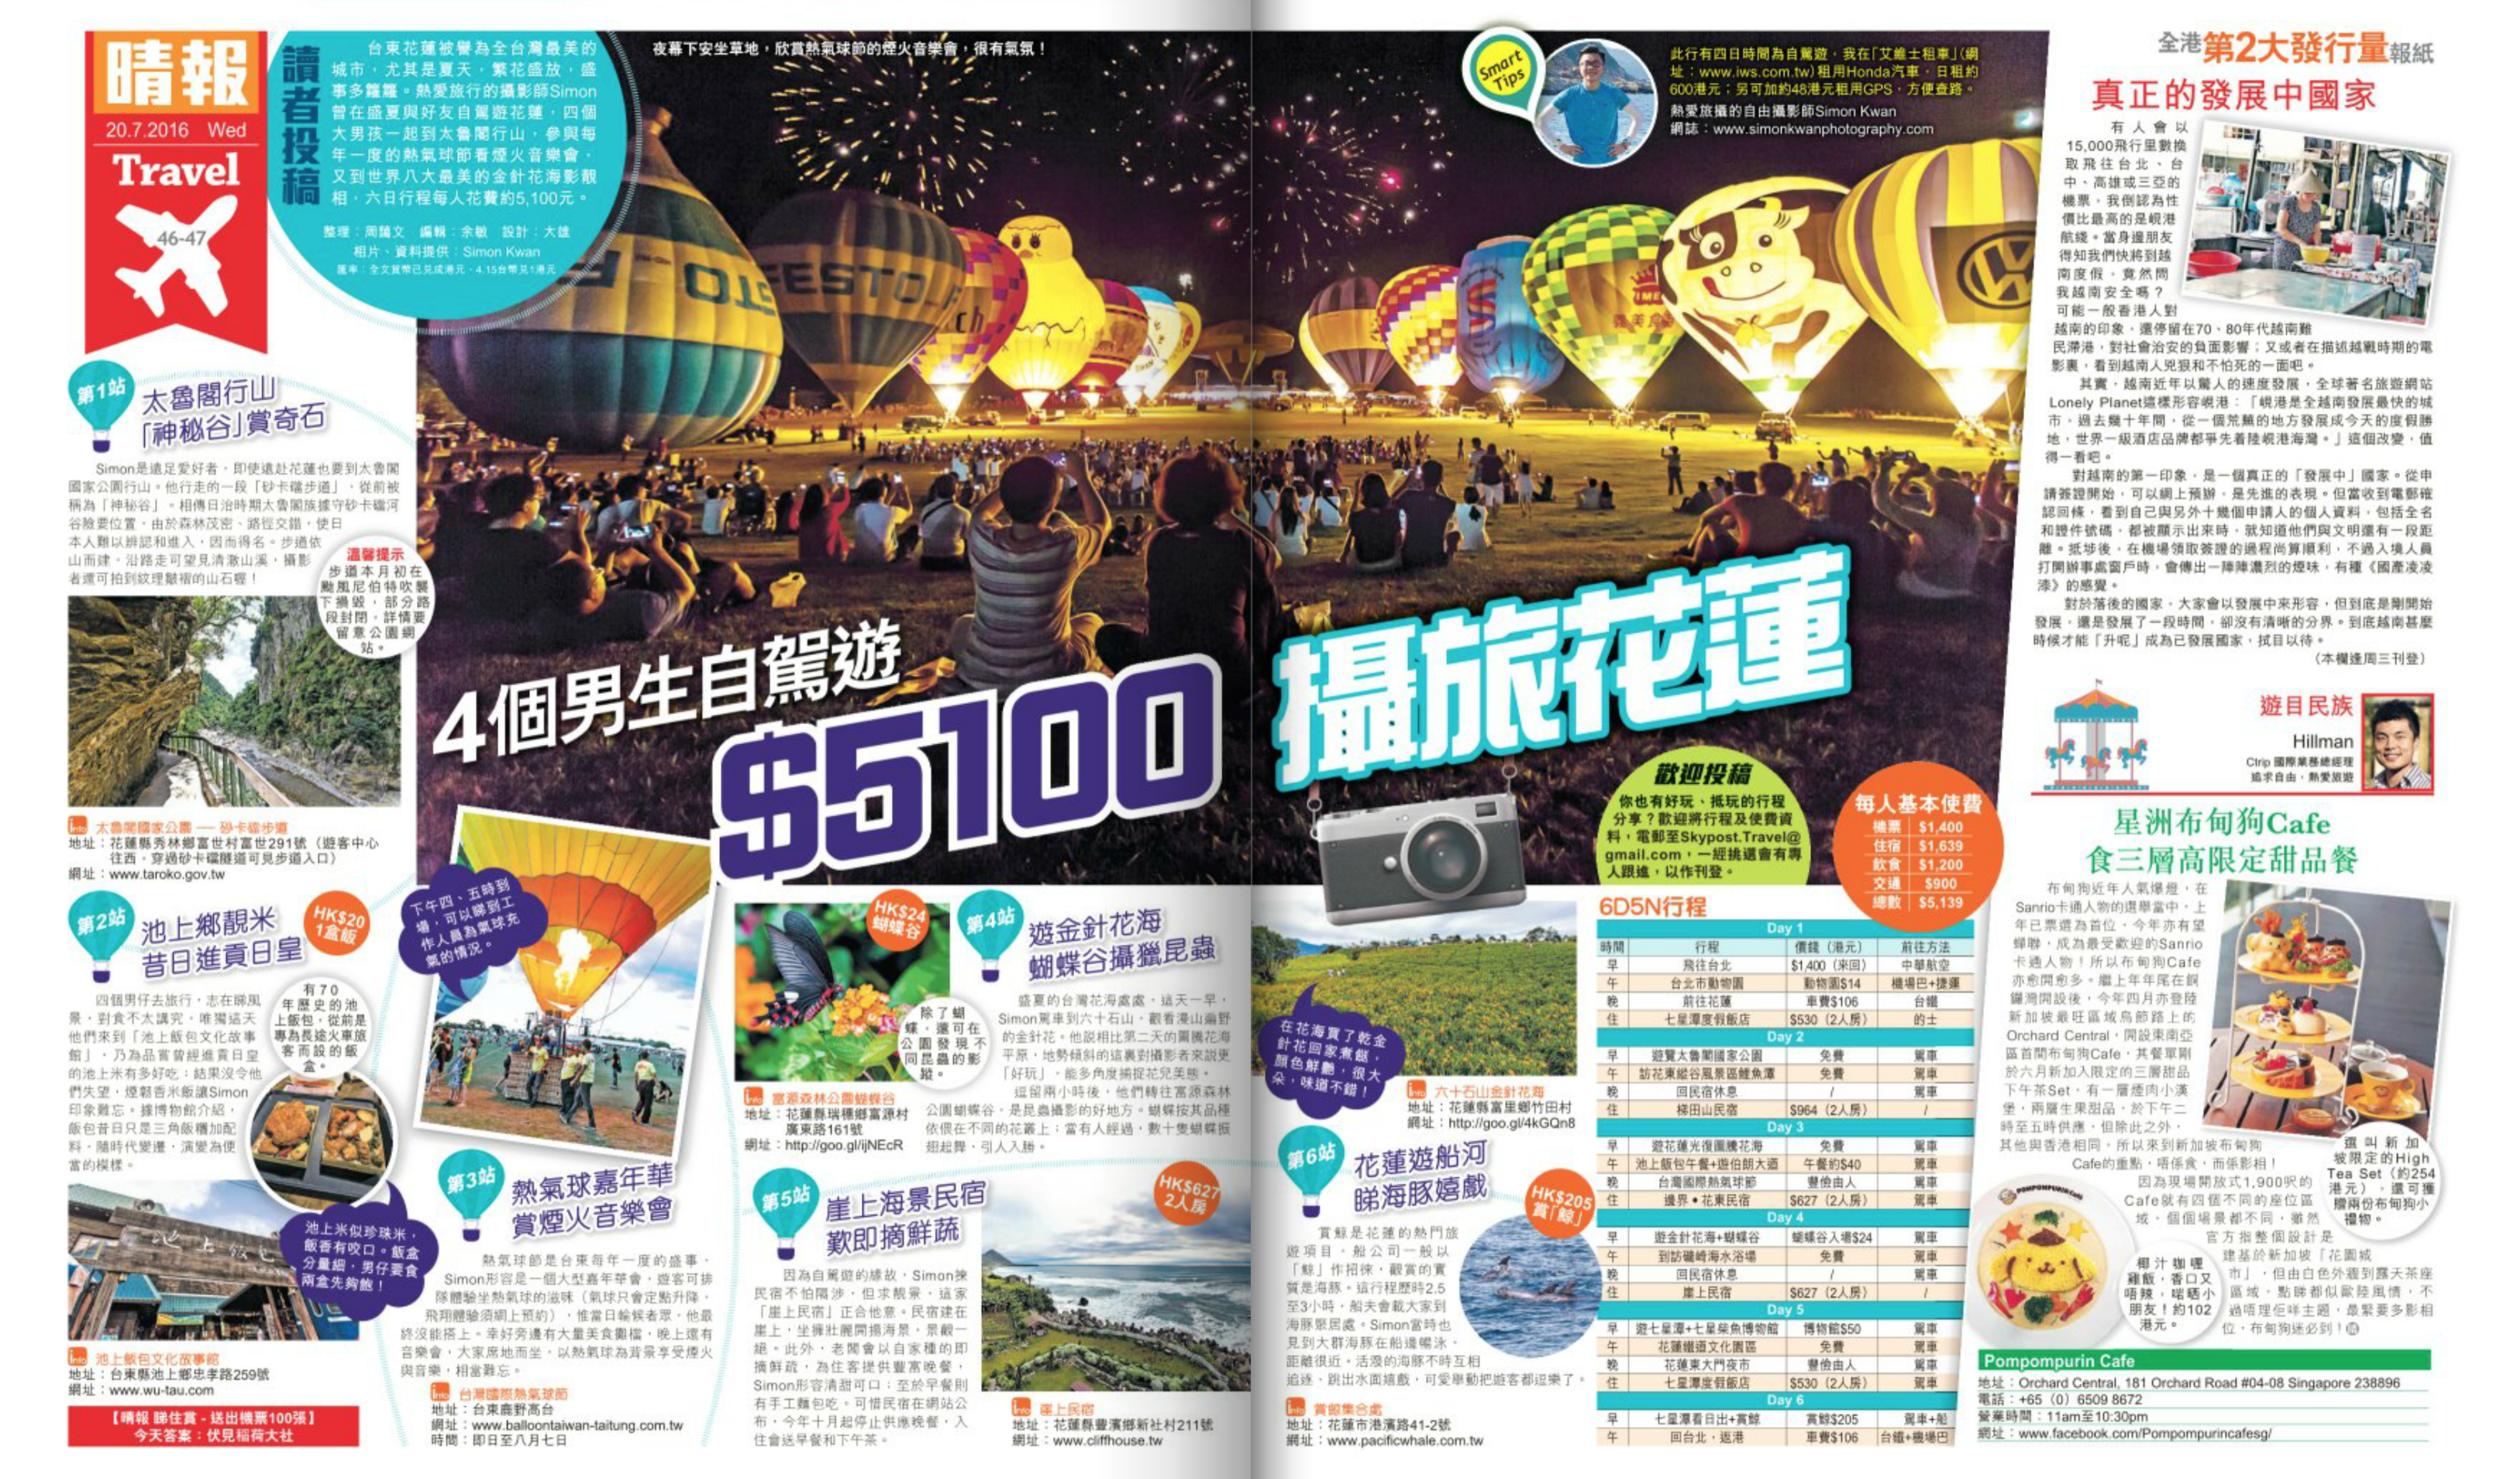 """4個男生自駕遊 $5100攝旅花蓮""   Yahoo! News Hong Kong  20.07.2016  Yahoo! News Online Version  https://hk.news.yahoo.com/4個男生自駕遊-5100攝旅花蓮-224553274.html?.b=index&.cf3=副刊&.cf4=3&.cf5=晴報&.cf6=%2F"